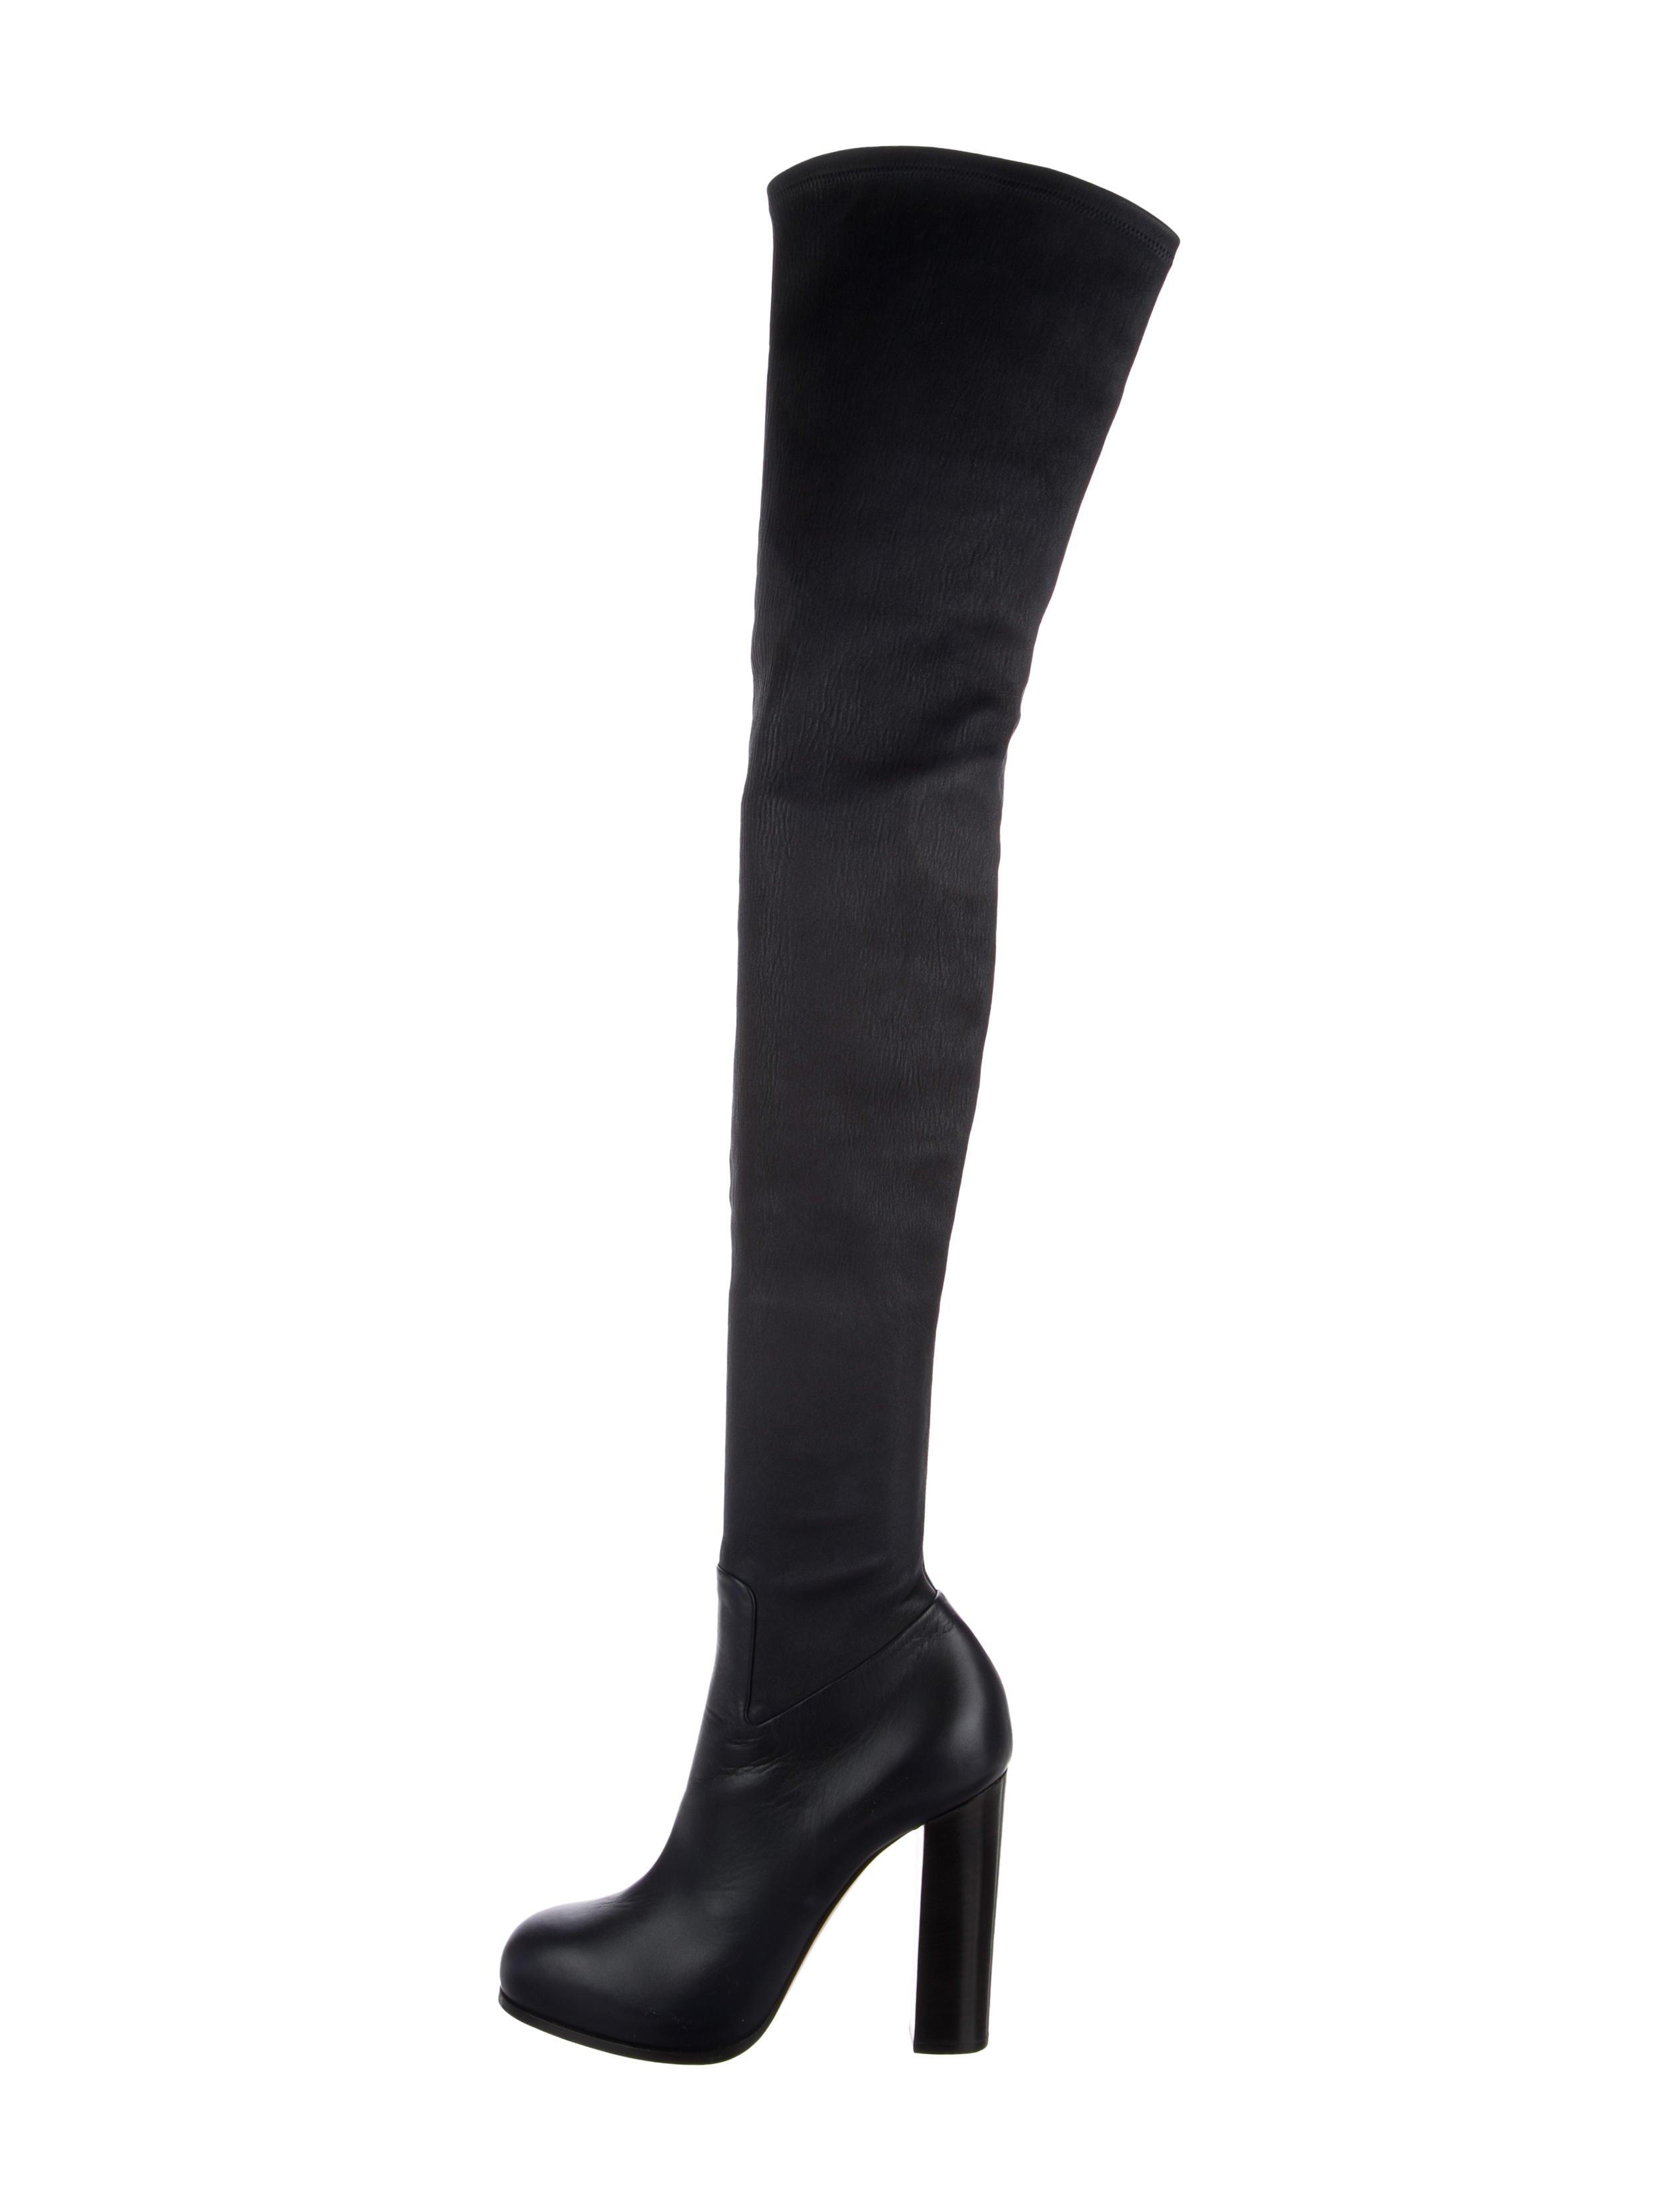 order for sale Céline Leather Platform Thigh-High boots explore cheap price fHTbq8B6fF